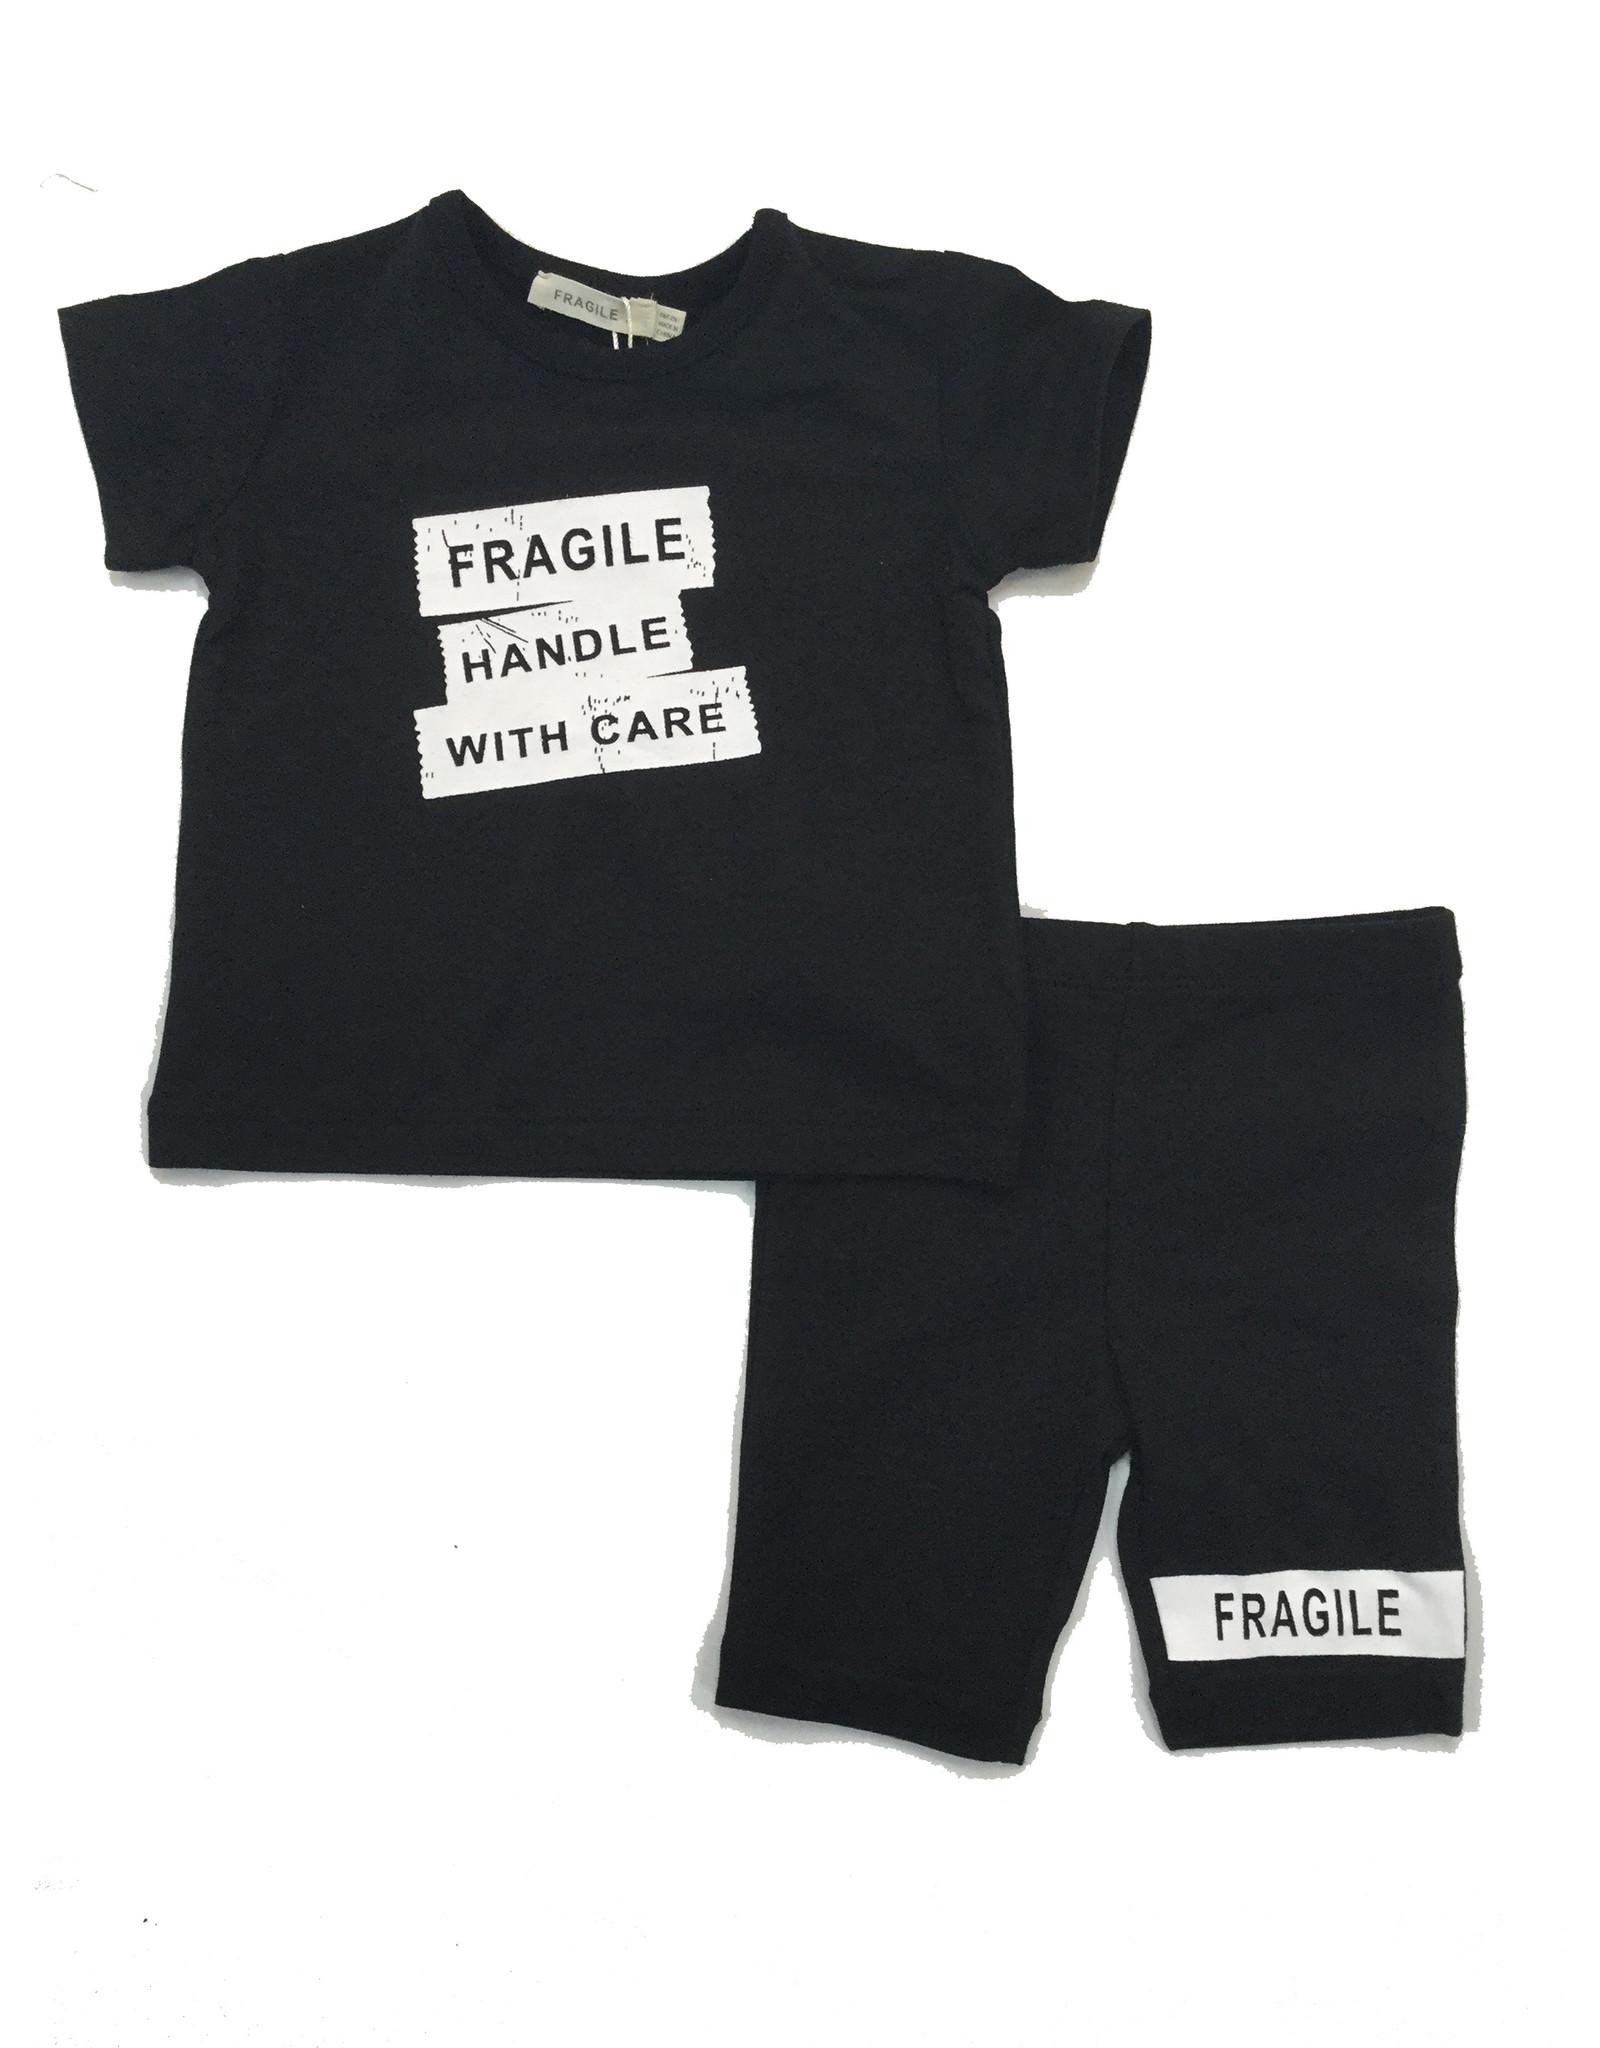 FRAGILE Fragile Fragile Handle With Care 2 Piece Set